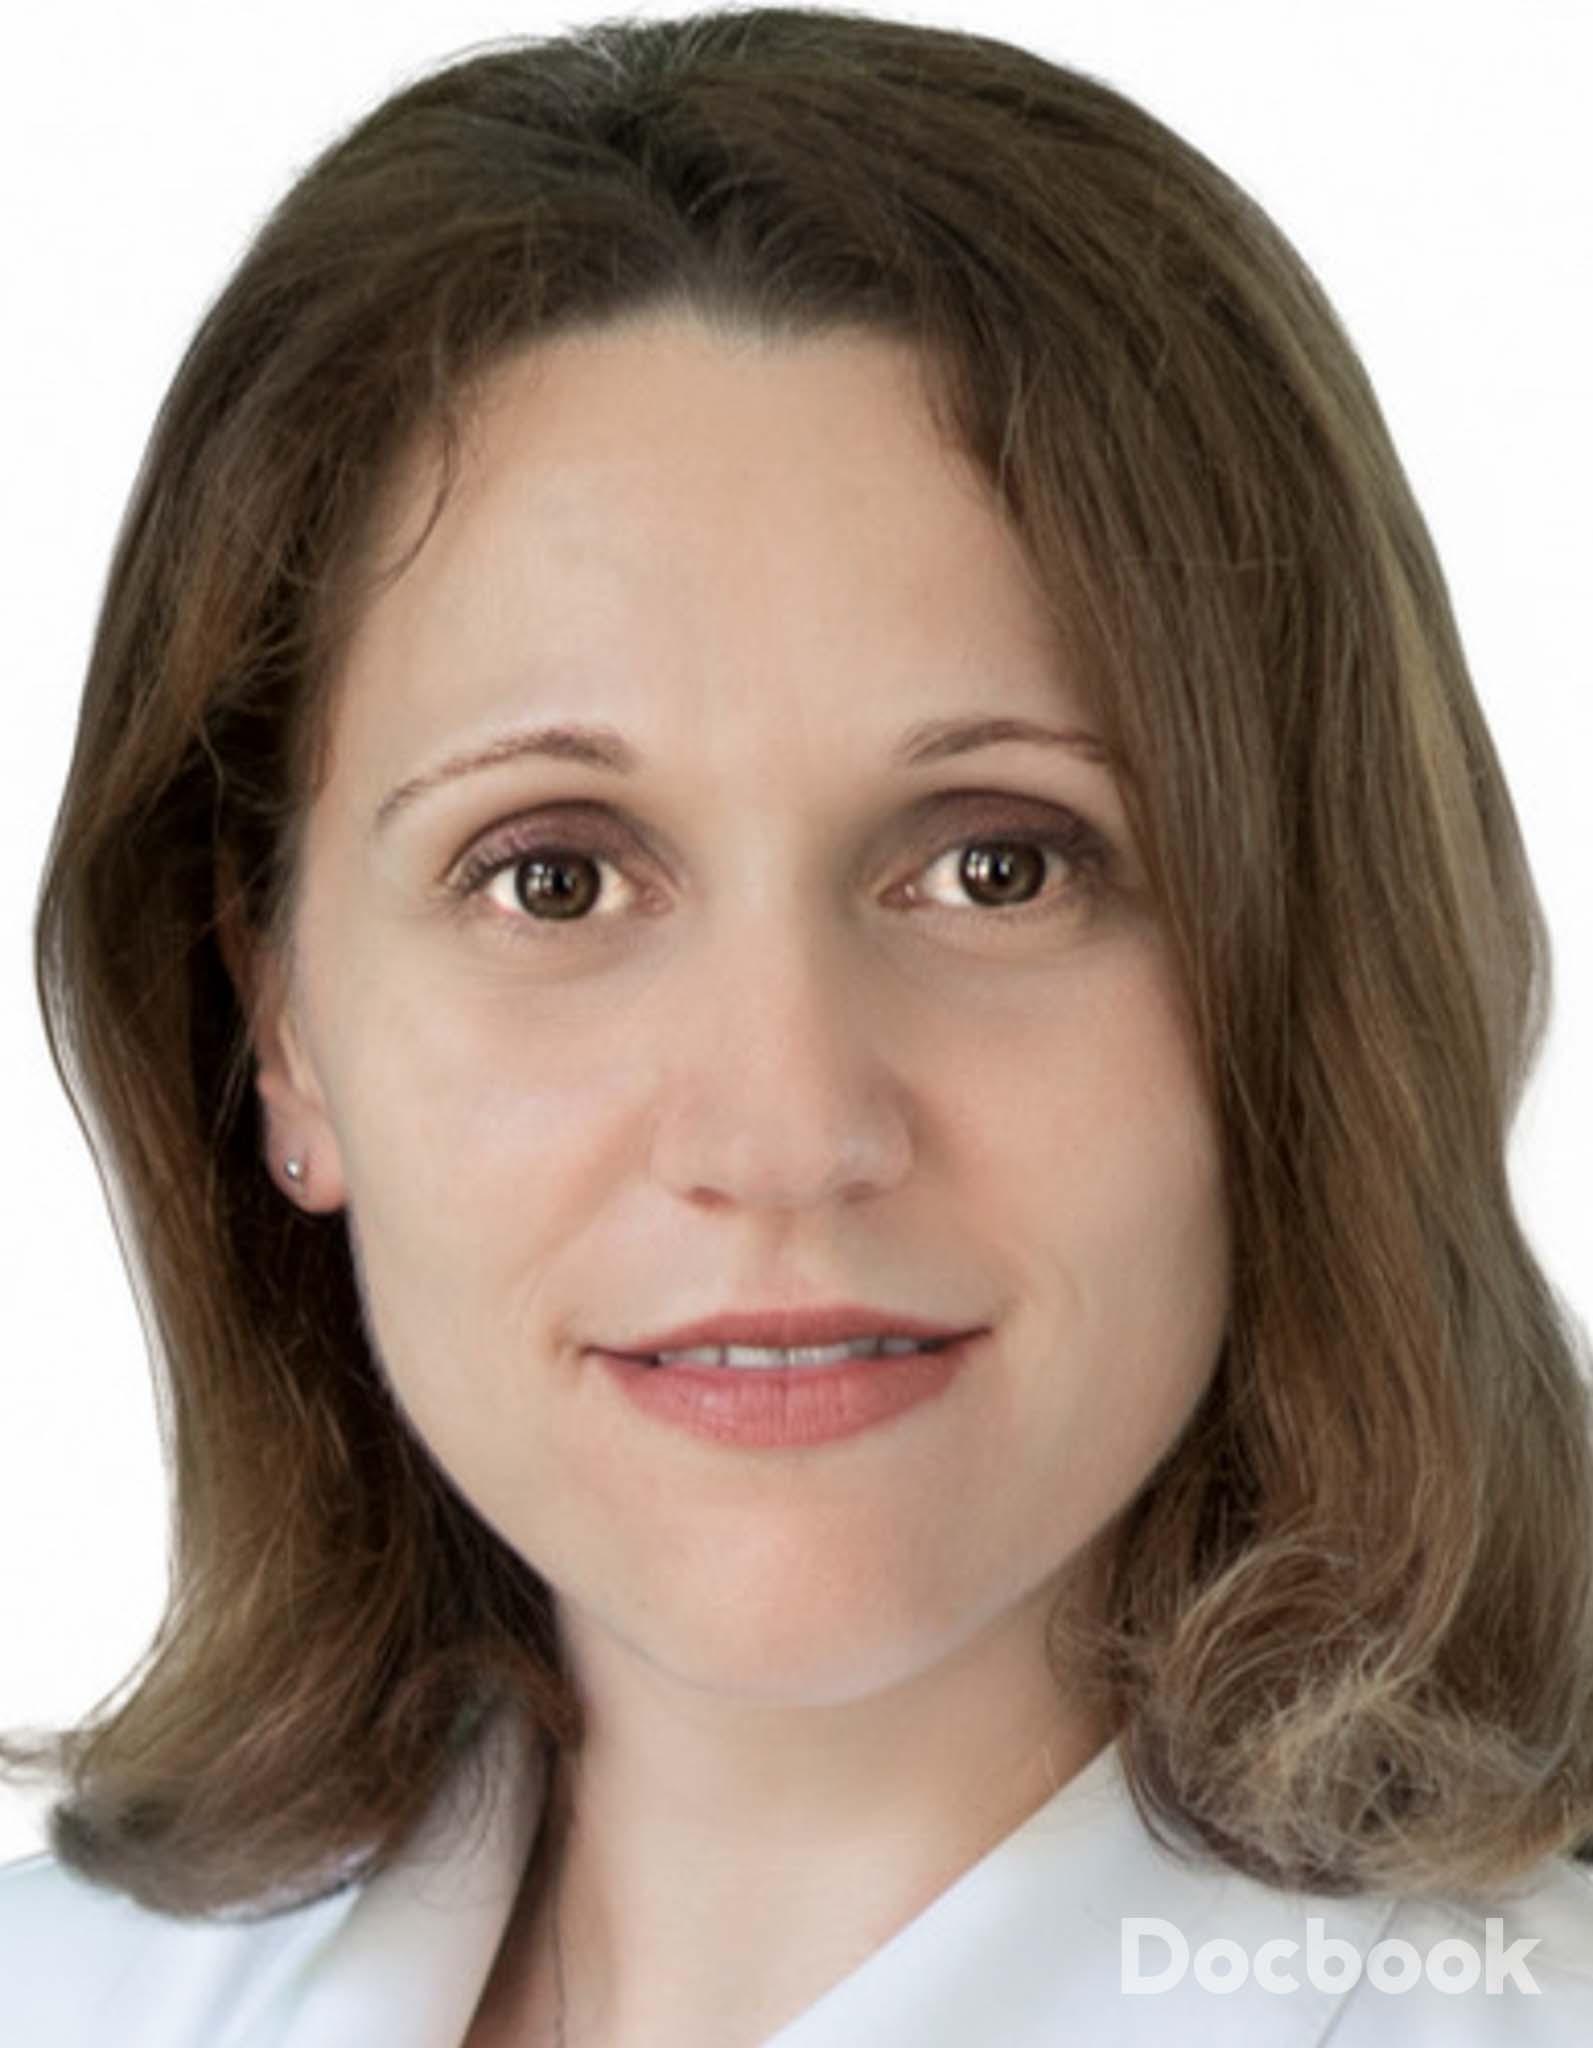 Dr. Ruxandra Simionescu